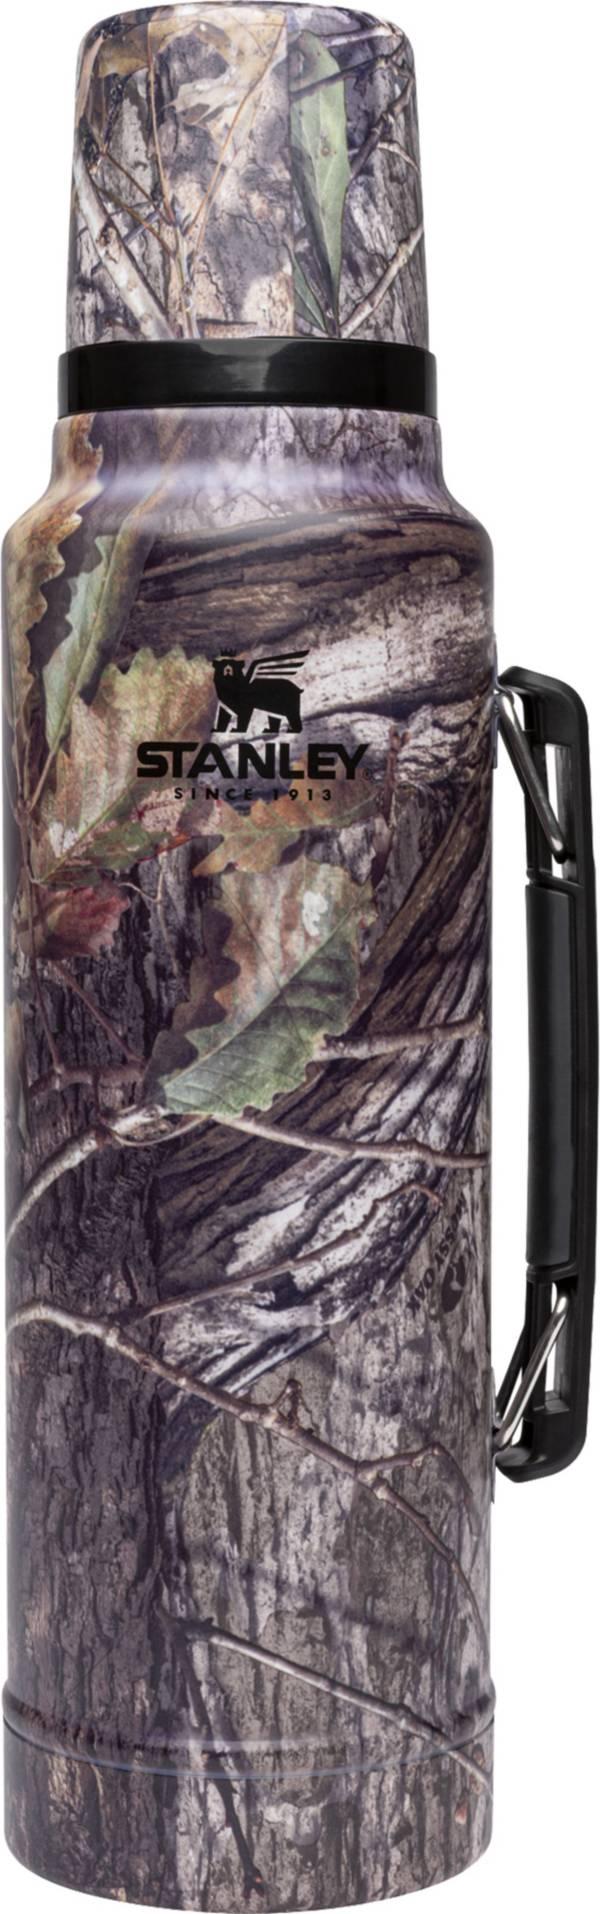 Stanley Classic Legendary Bottle product image